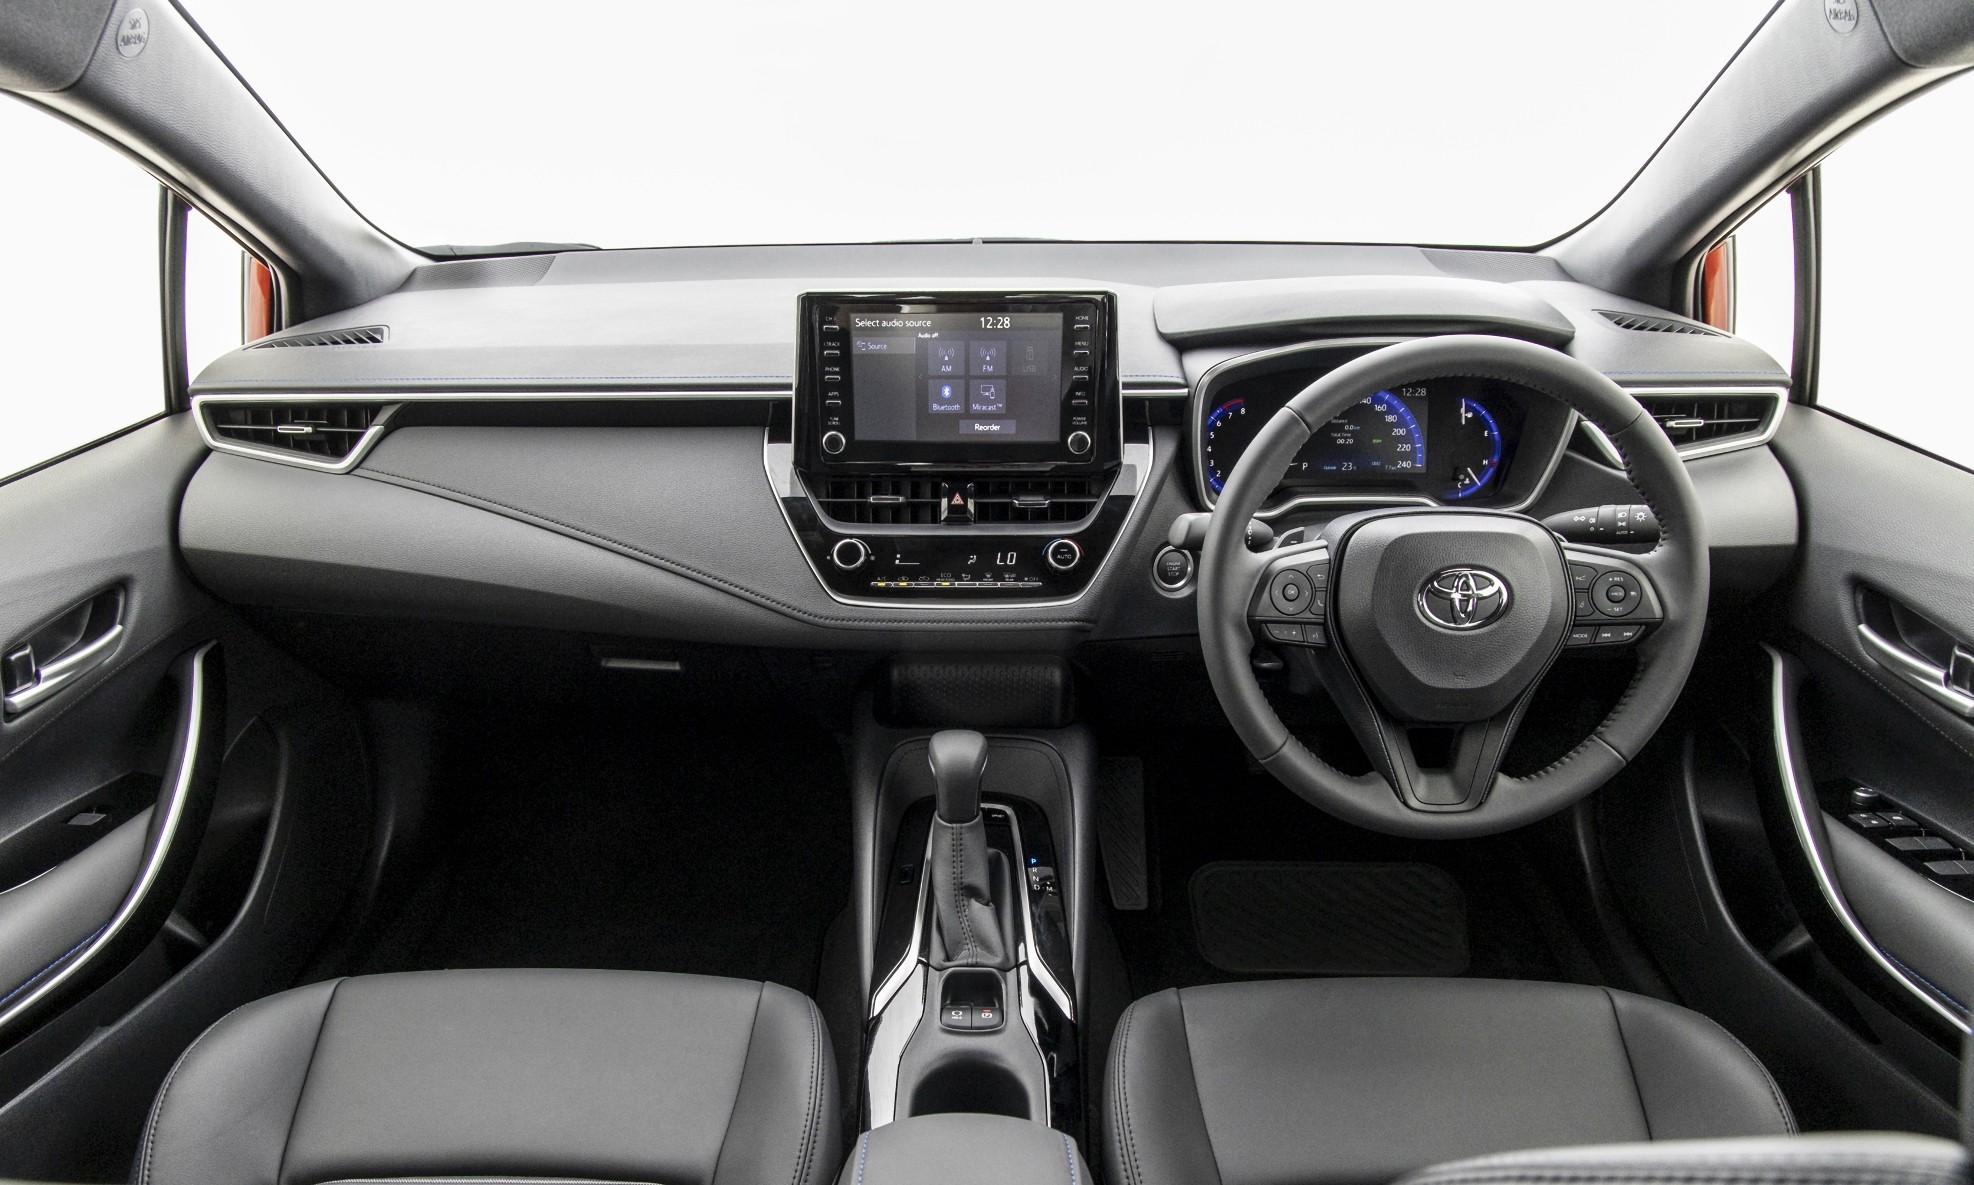 New Toyota Corolla dashboard